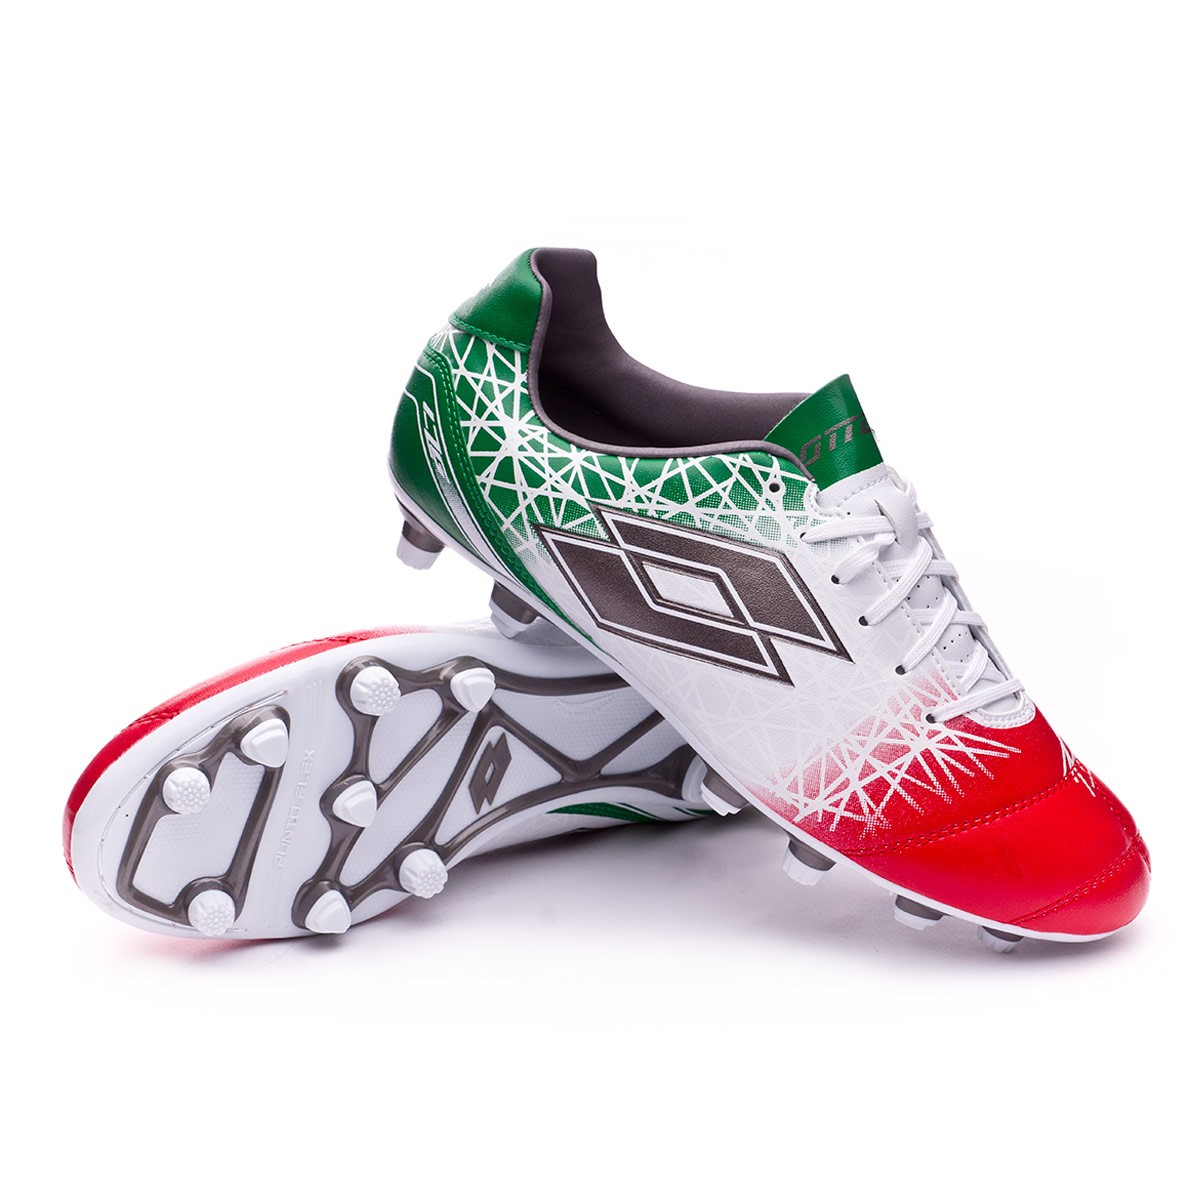 Boot Lotto Zhero Gravity 700 X FG White-Tit grey - Leaked soccer d29c507481500